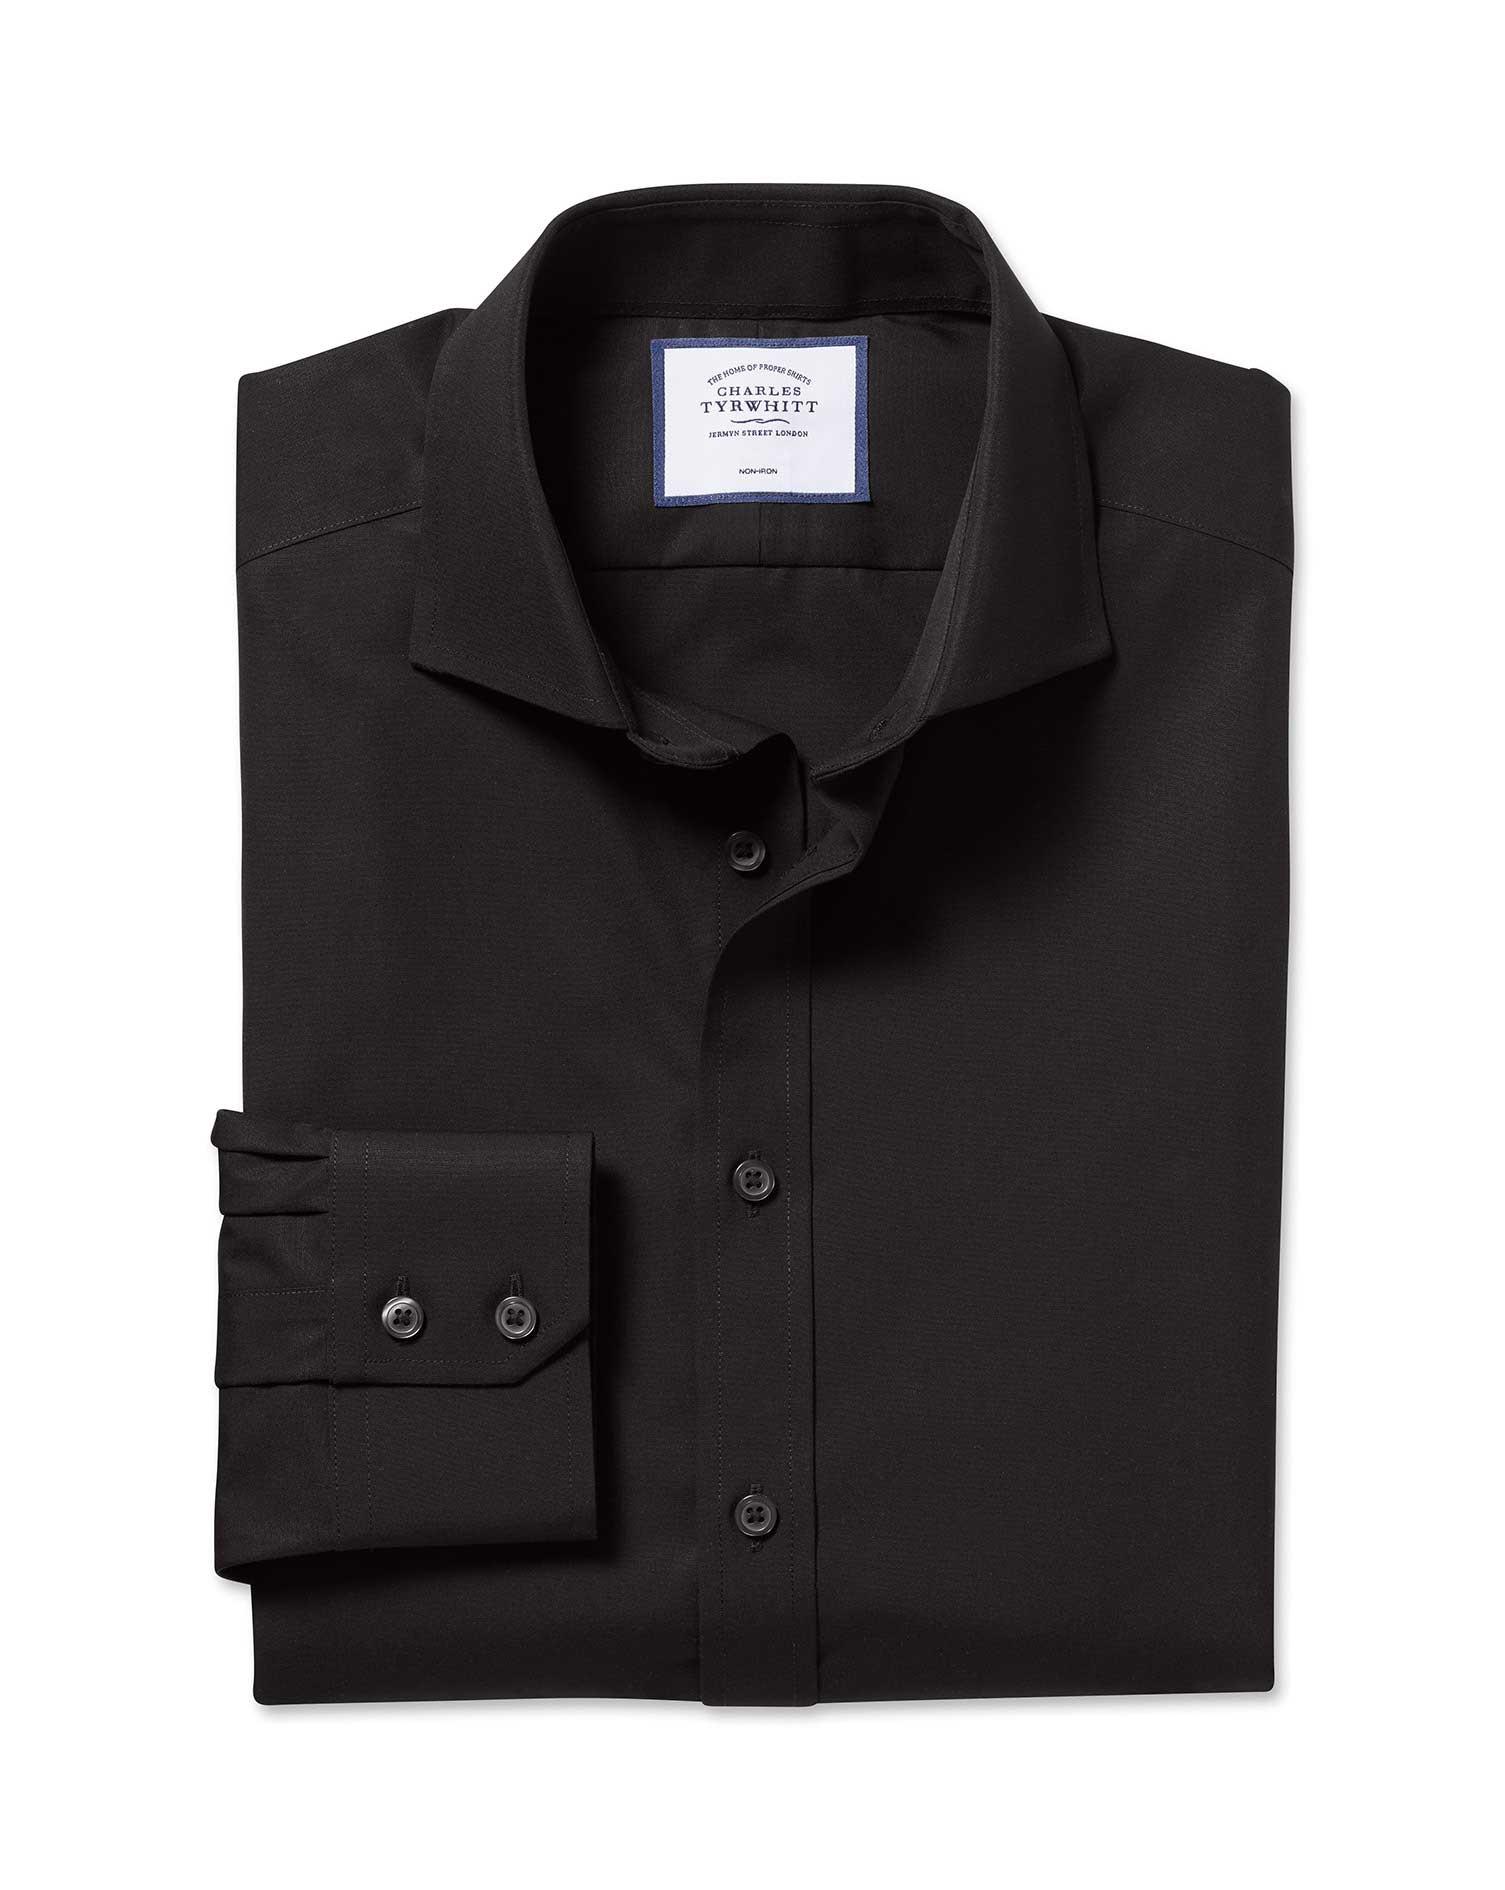 Slim Fit Cutaway Non-Iron Poplin Black Cotton Formal Shirt Single Cuff Size 16/38 by Charles Tyrwhit